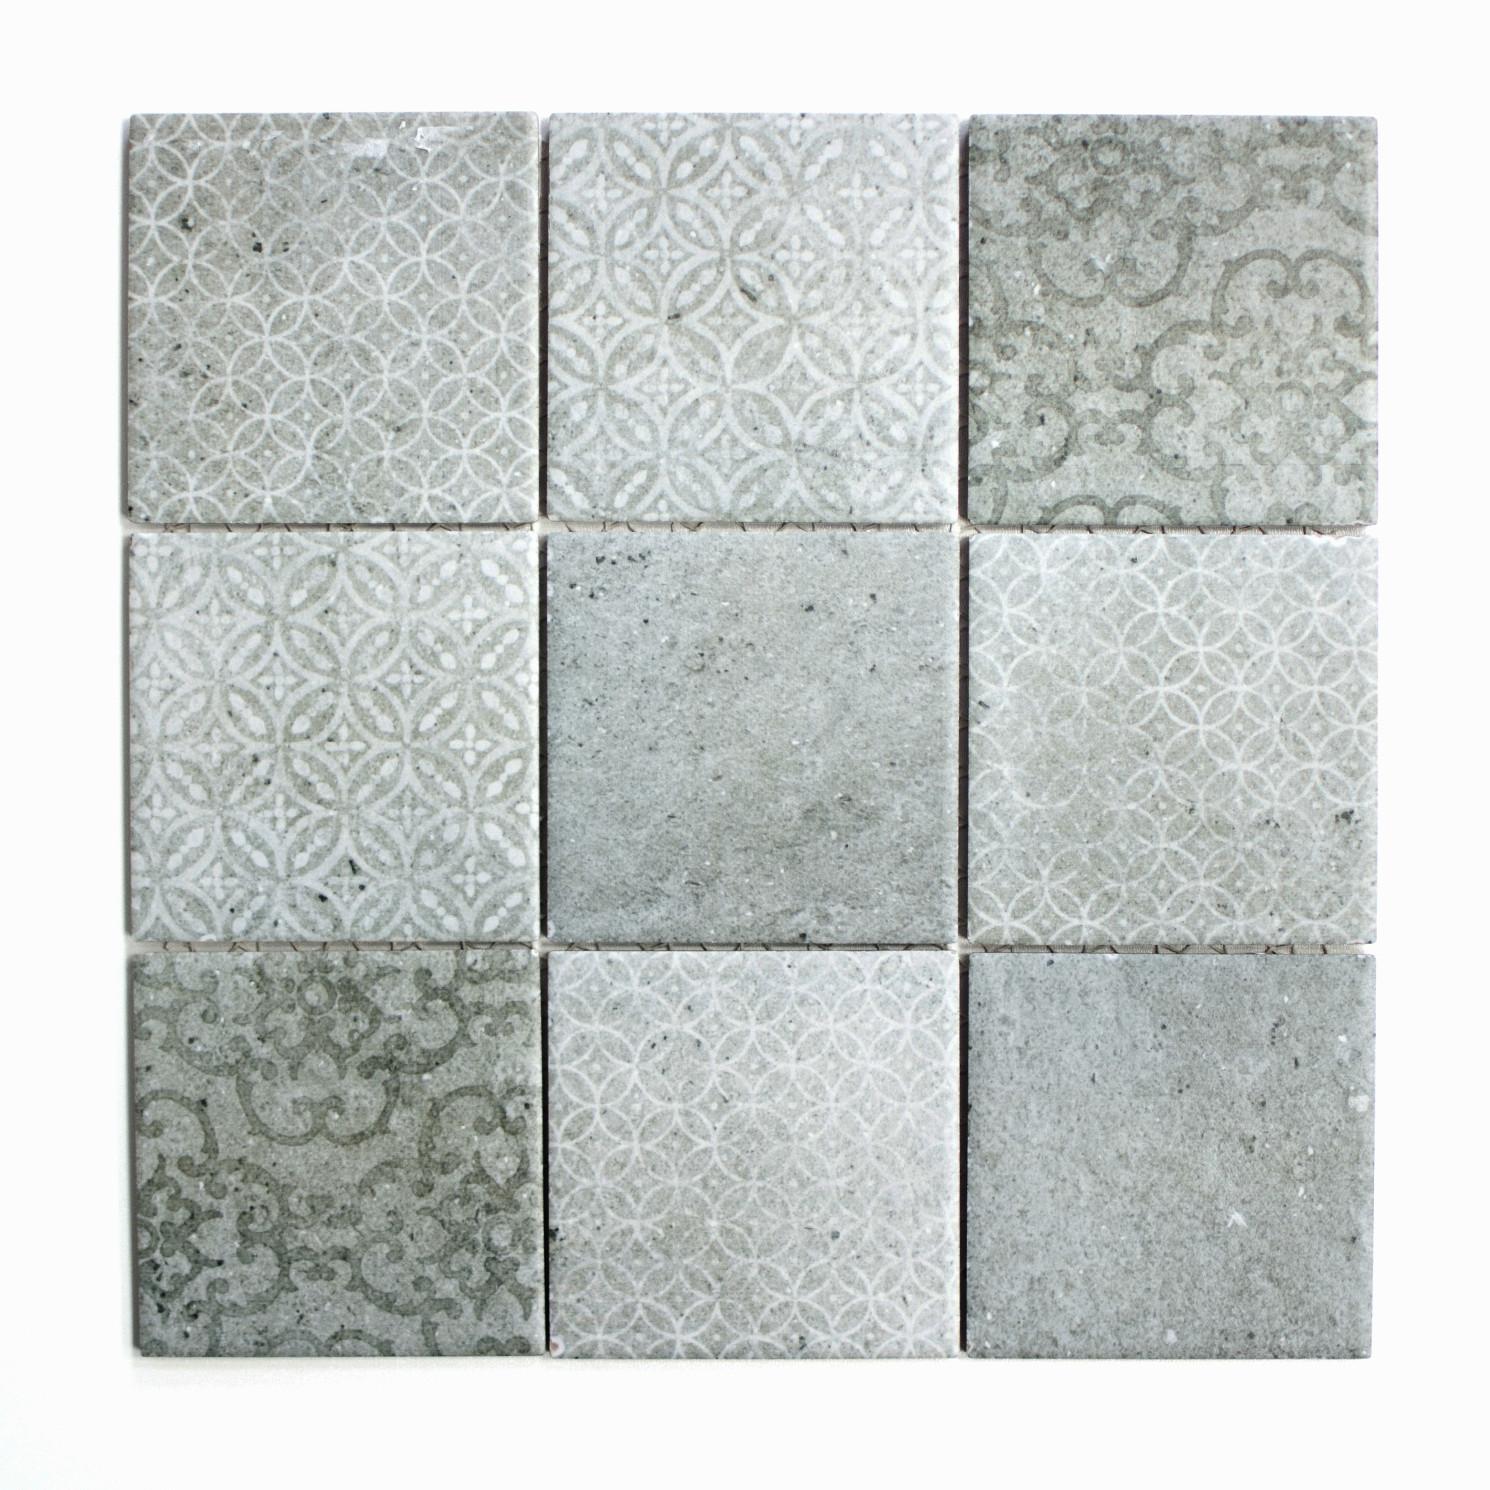 Mosaikmatte Quadrat shabby chic grey matt